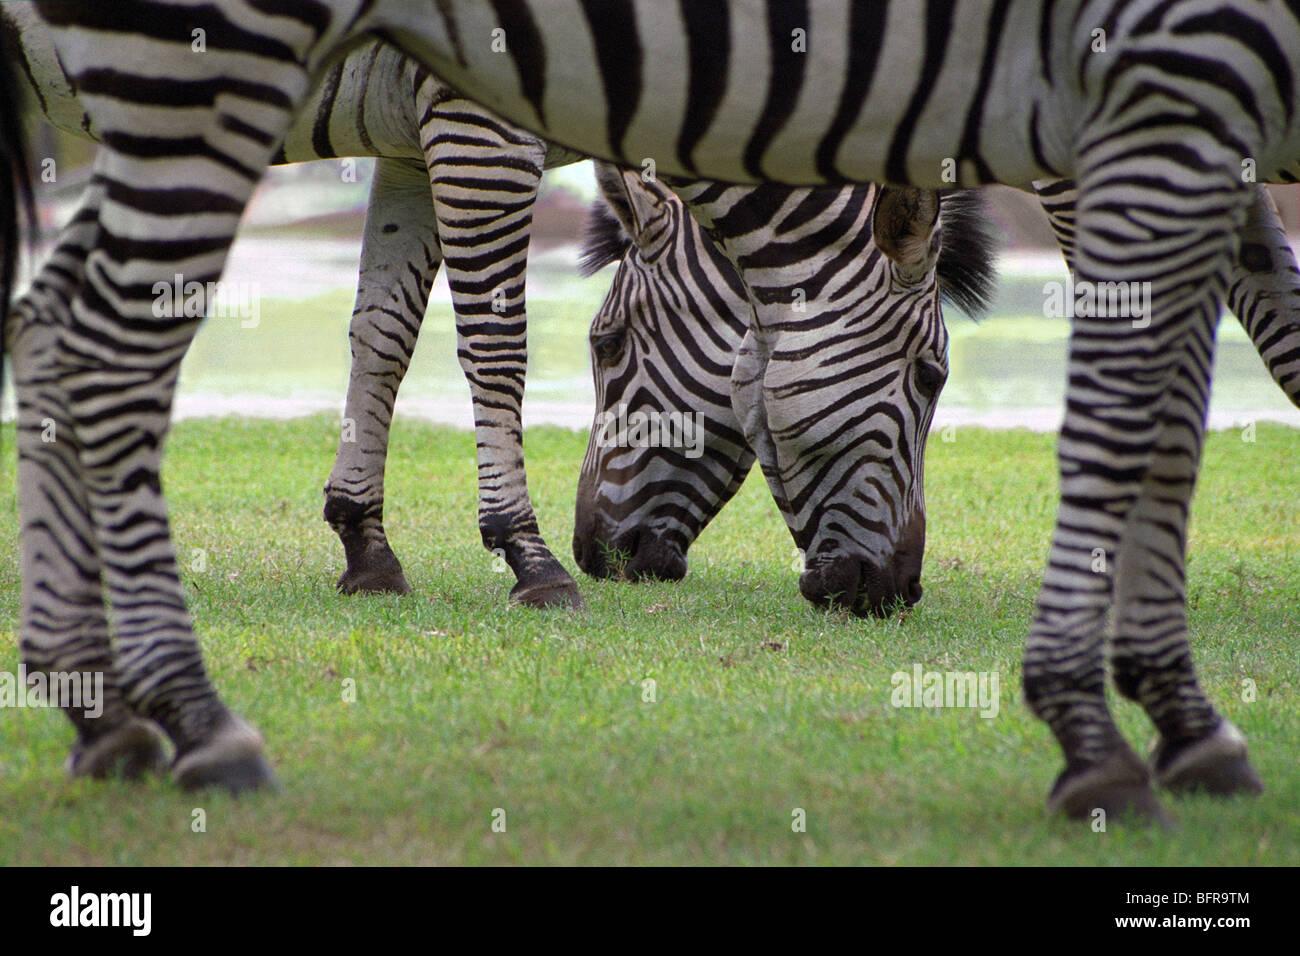 Zambia Zebra African Animal Imágenes De Stock & Zambia Zebra African ...